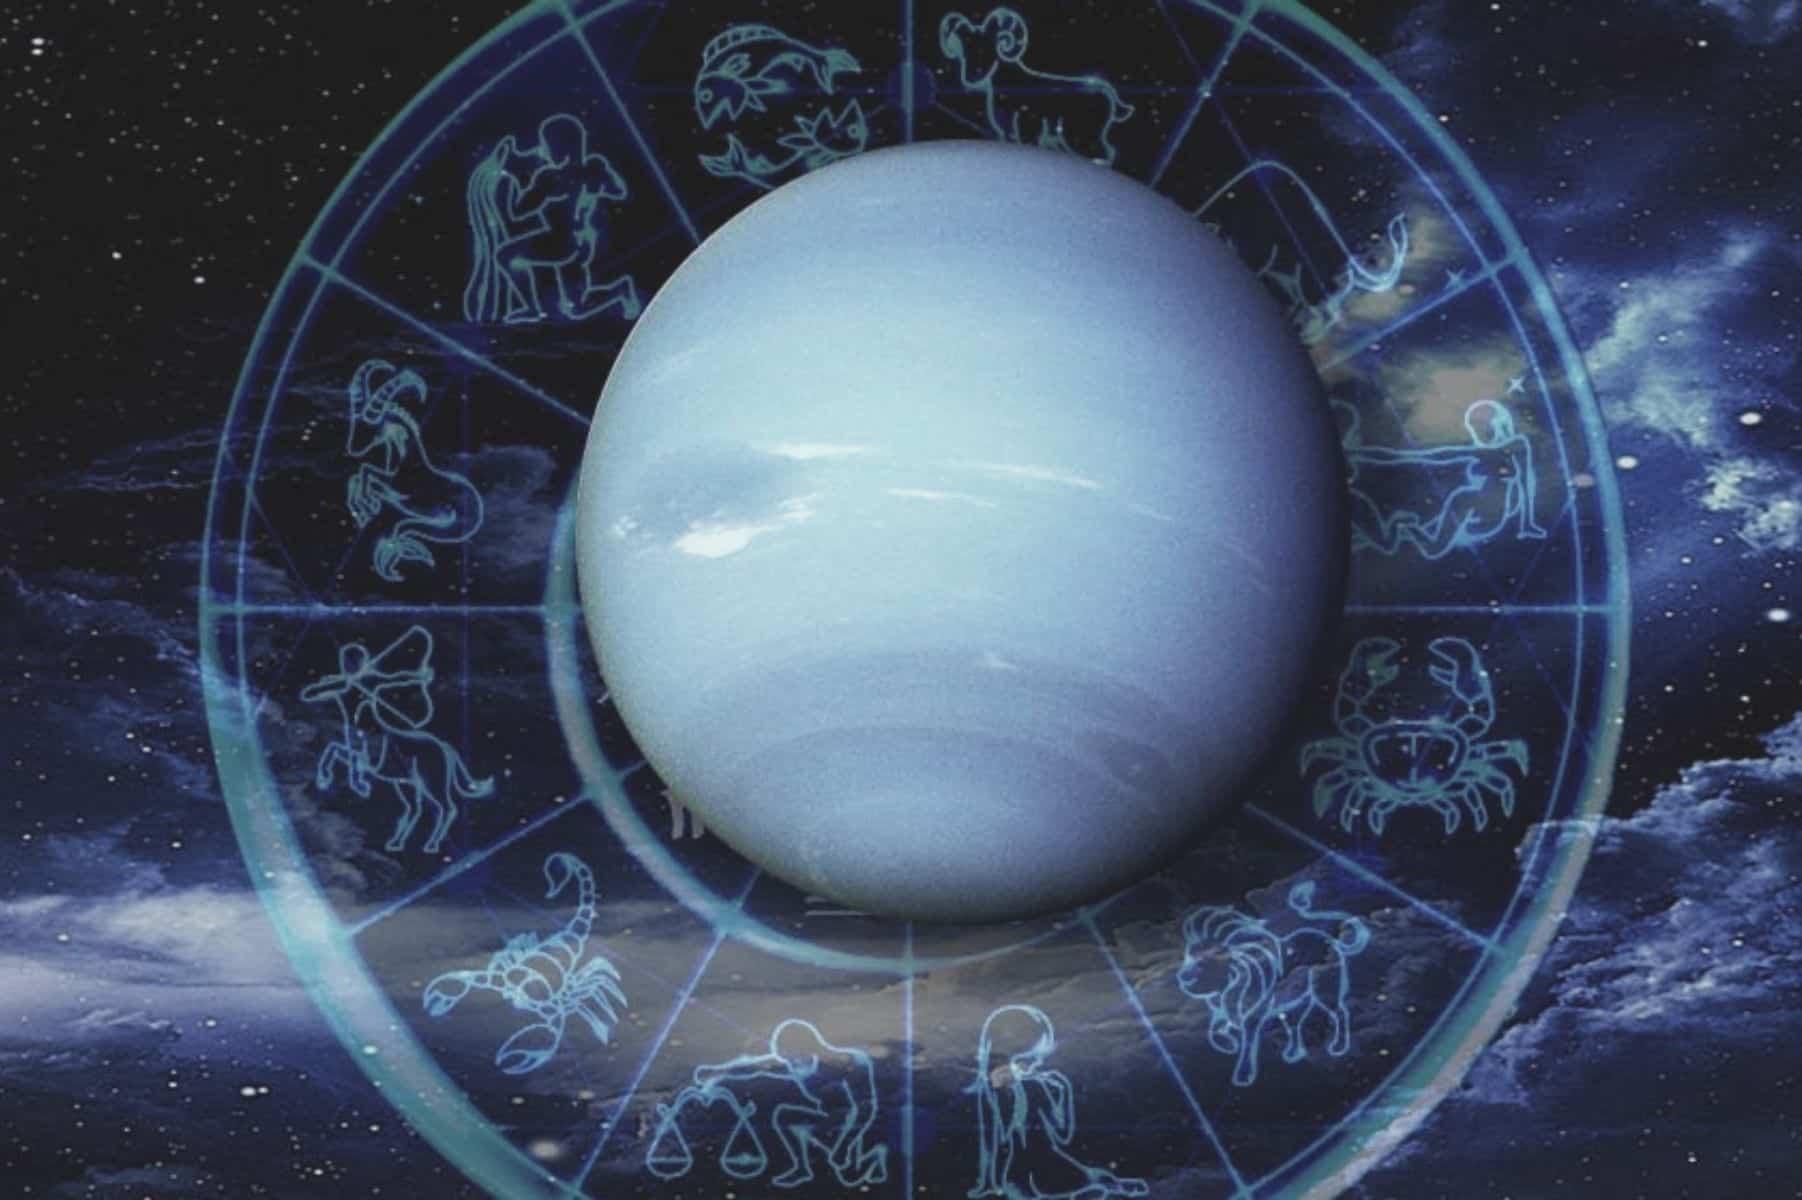 Urano na astrologia